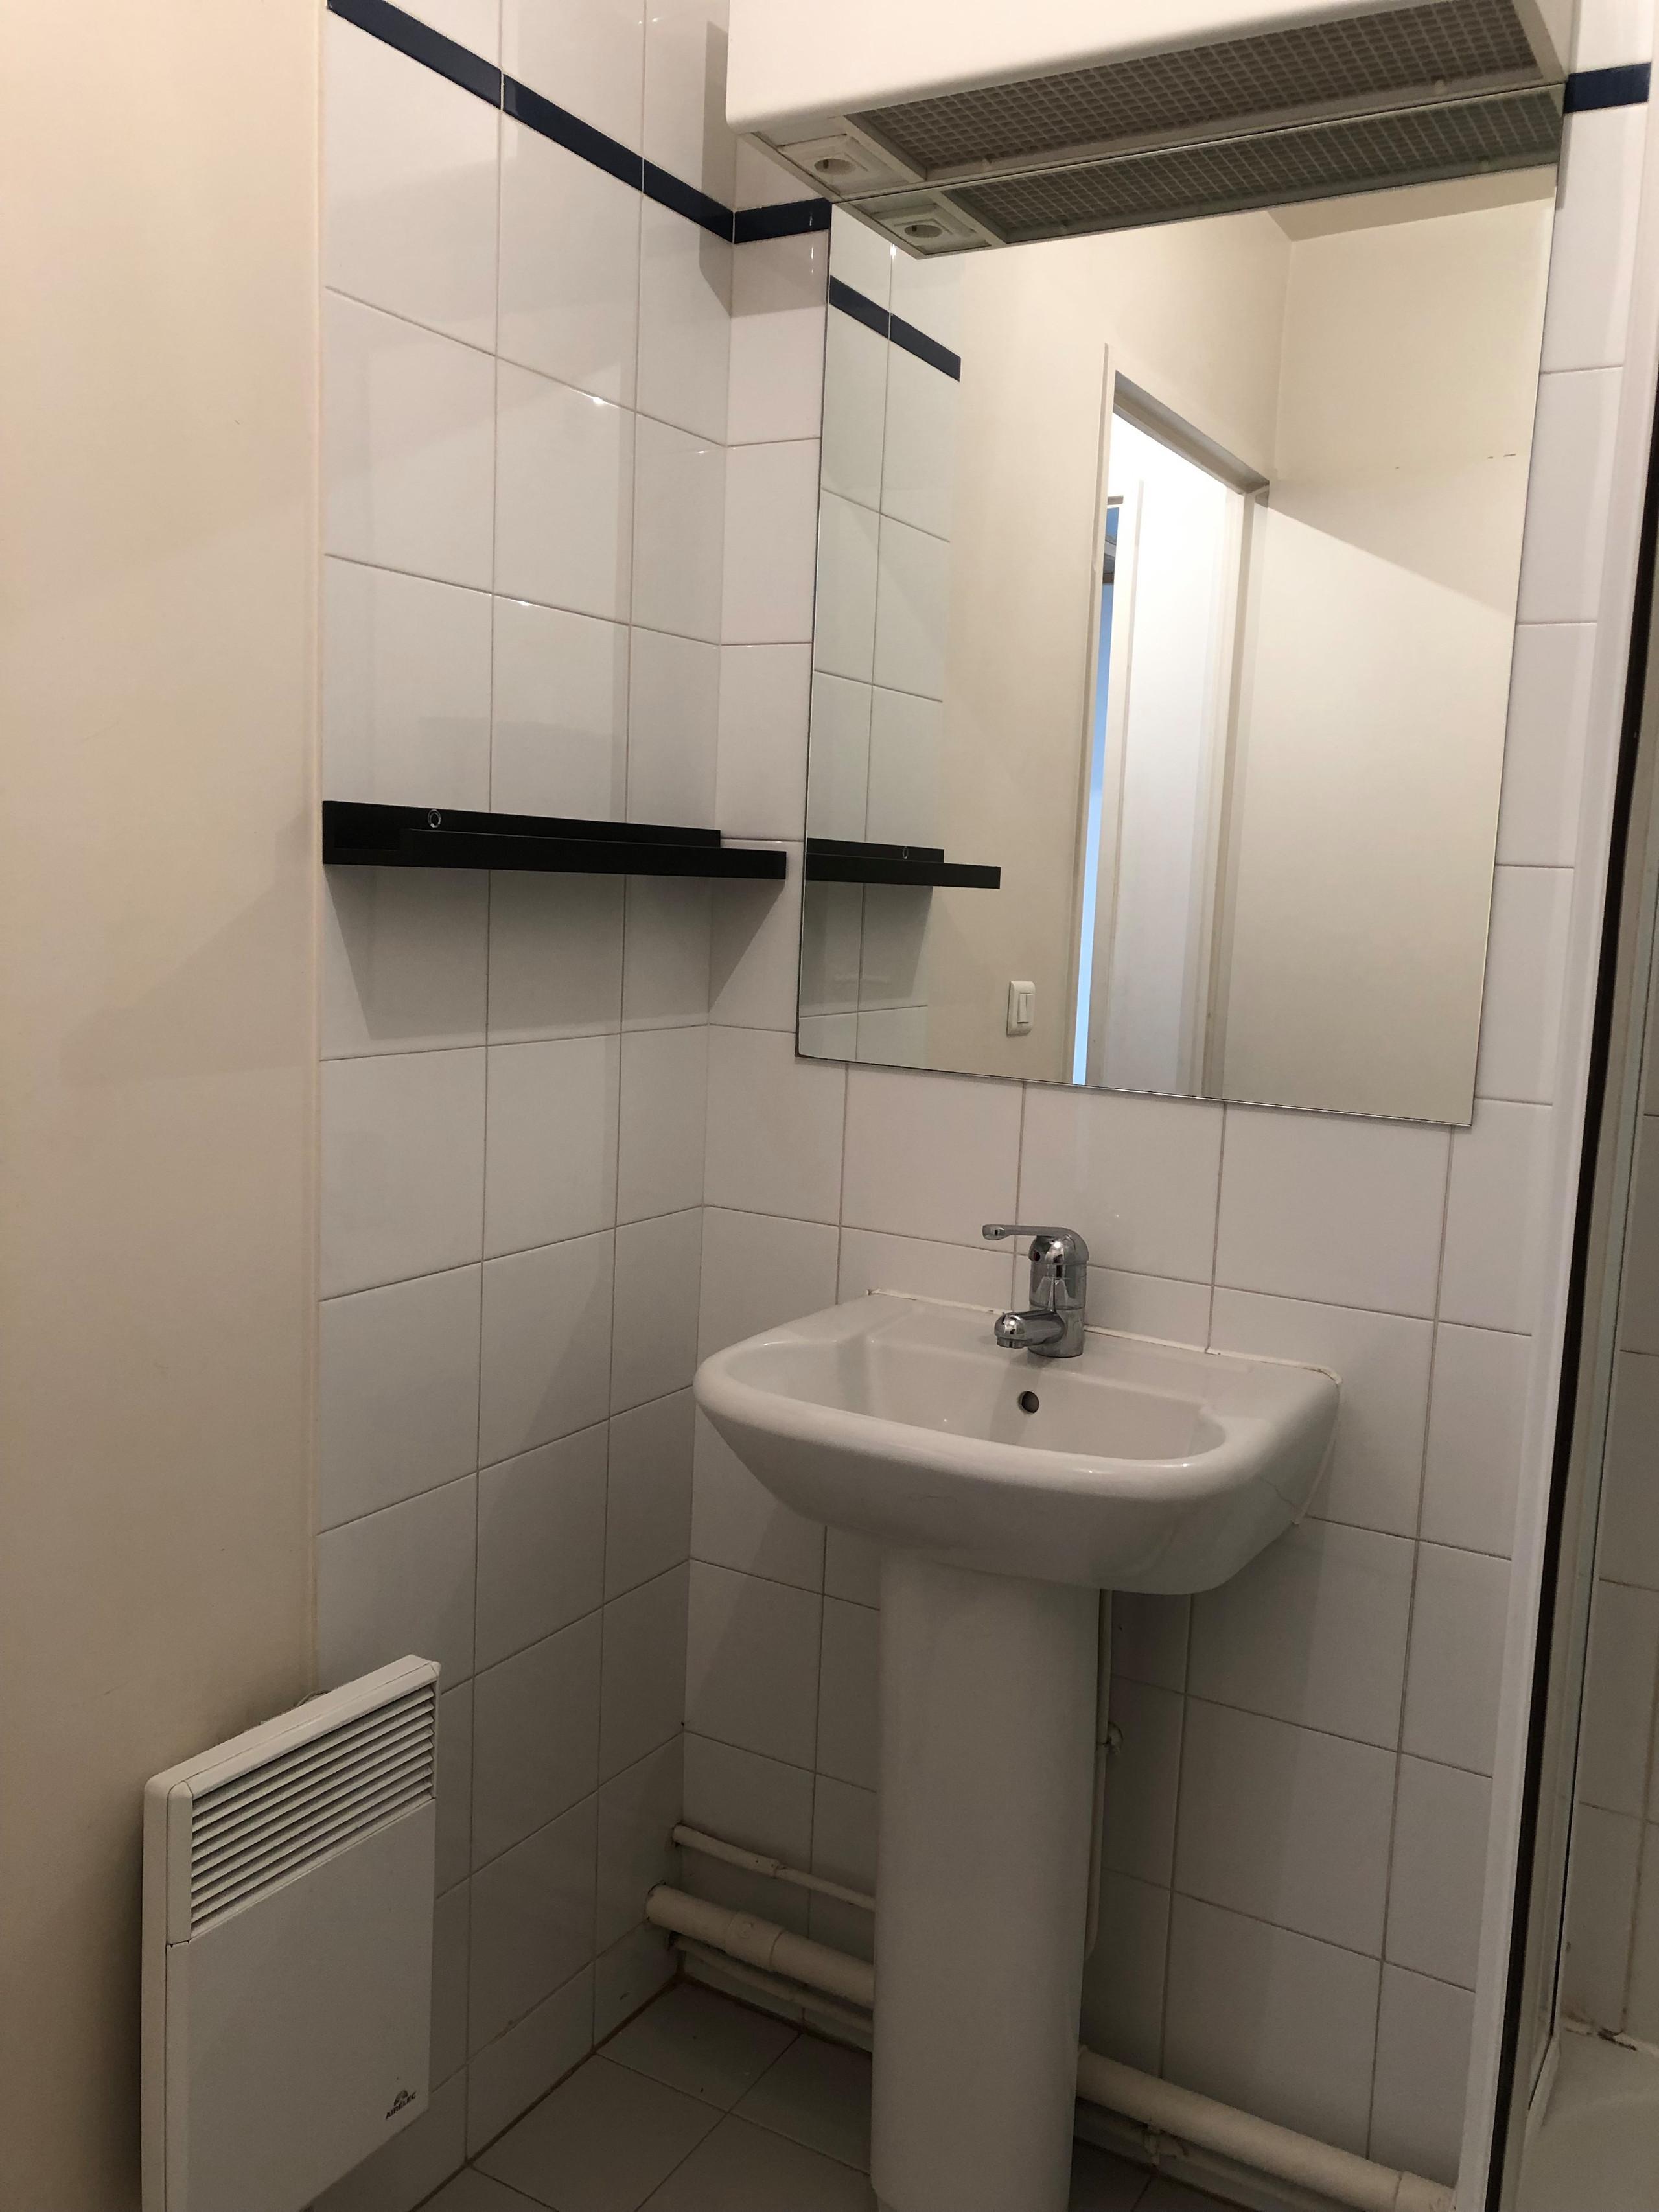 La salle de bain avant sa rénovation